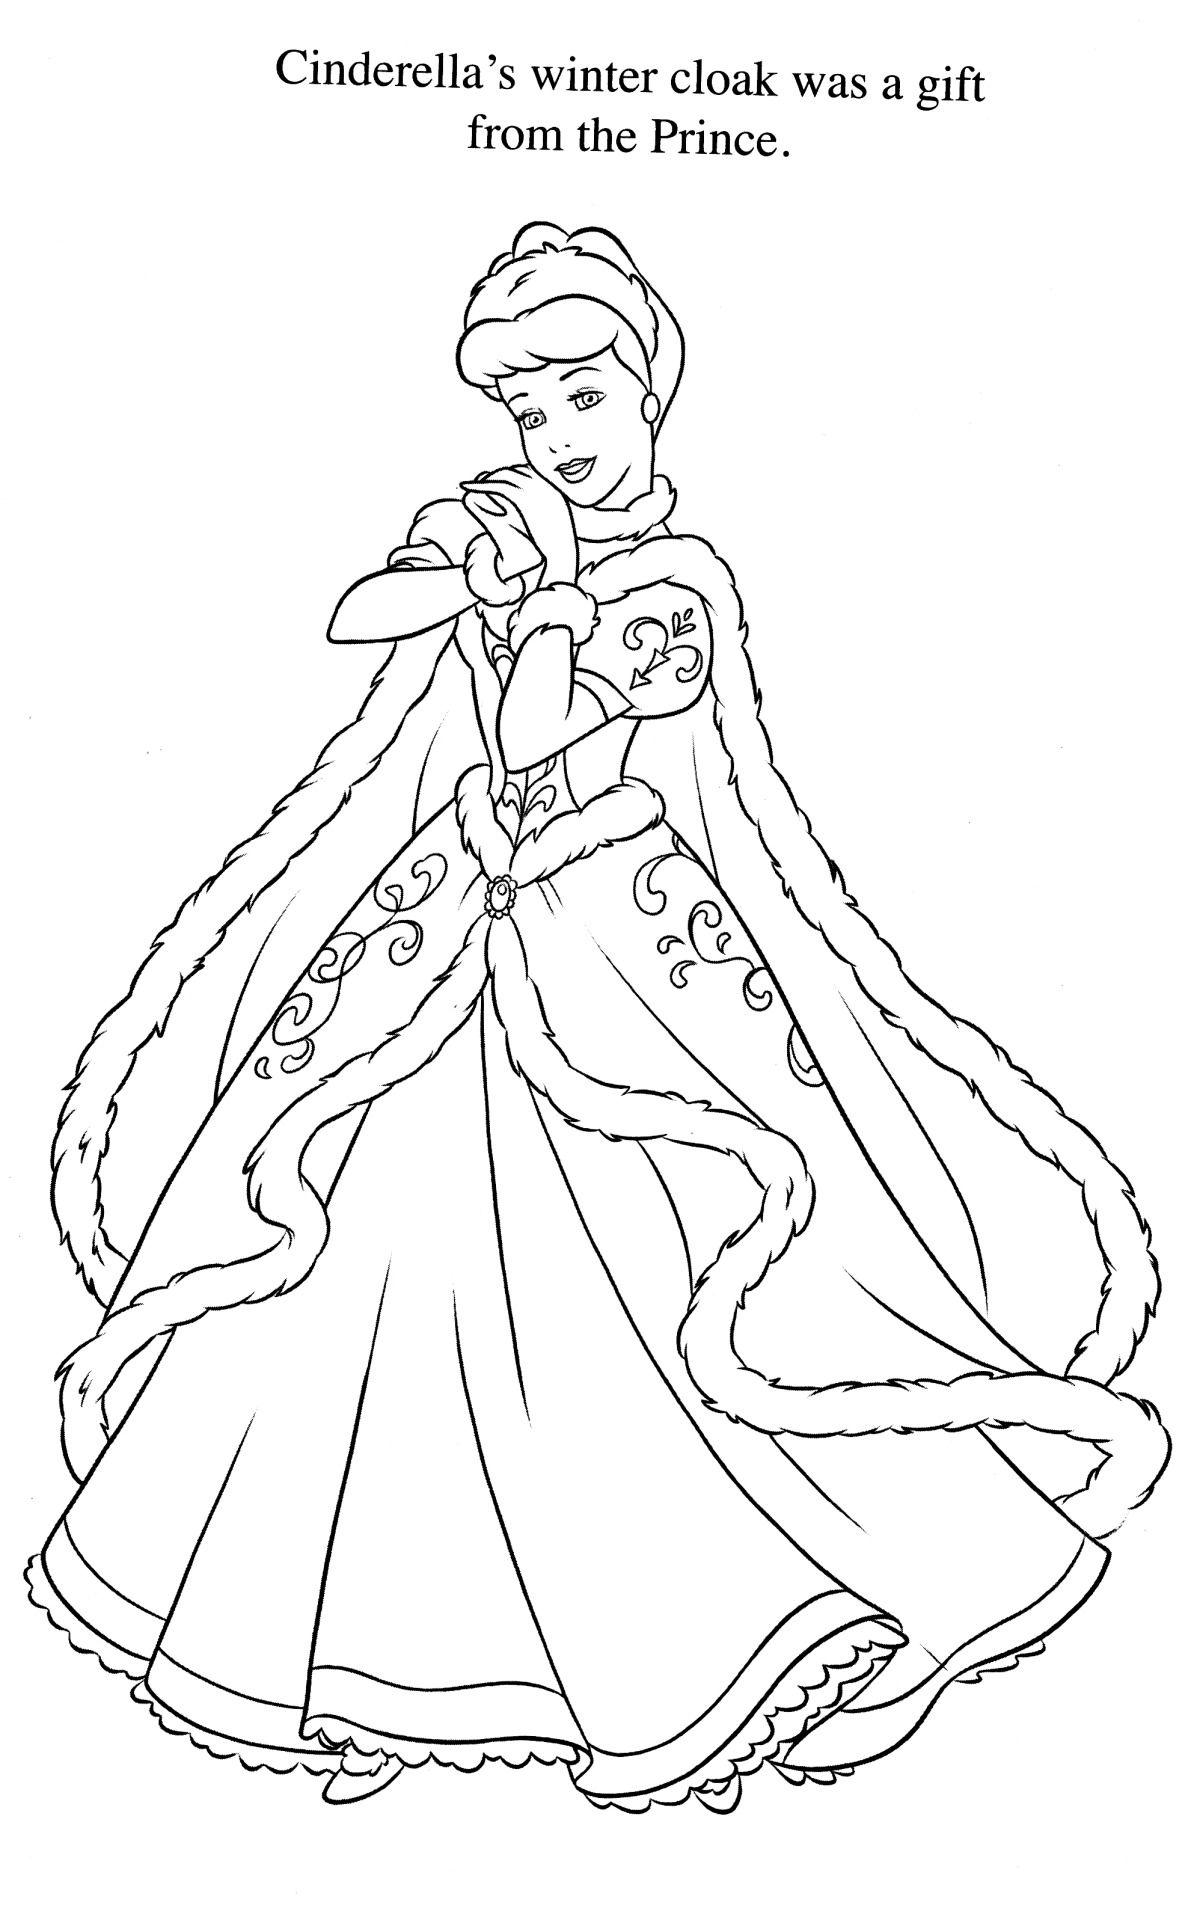 Disney Coloring Pages  Disney princess coloring pages, Disney